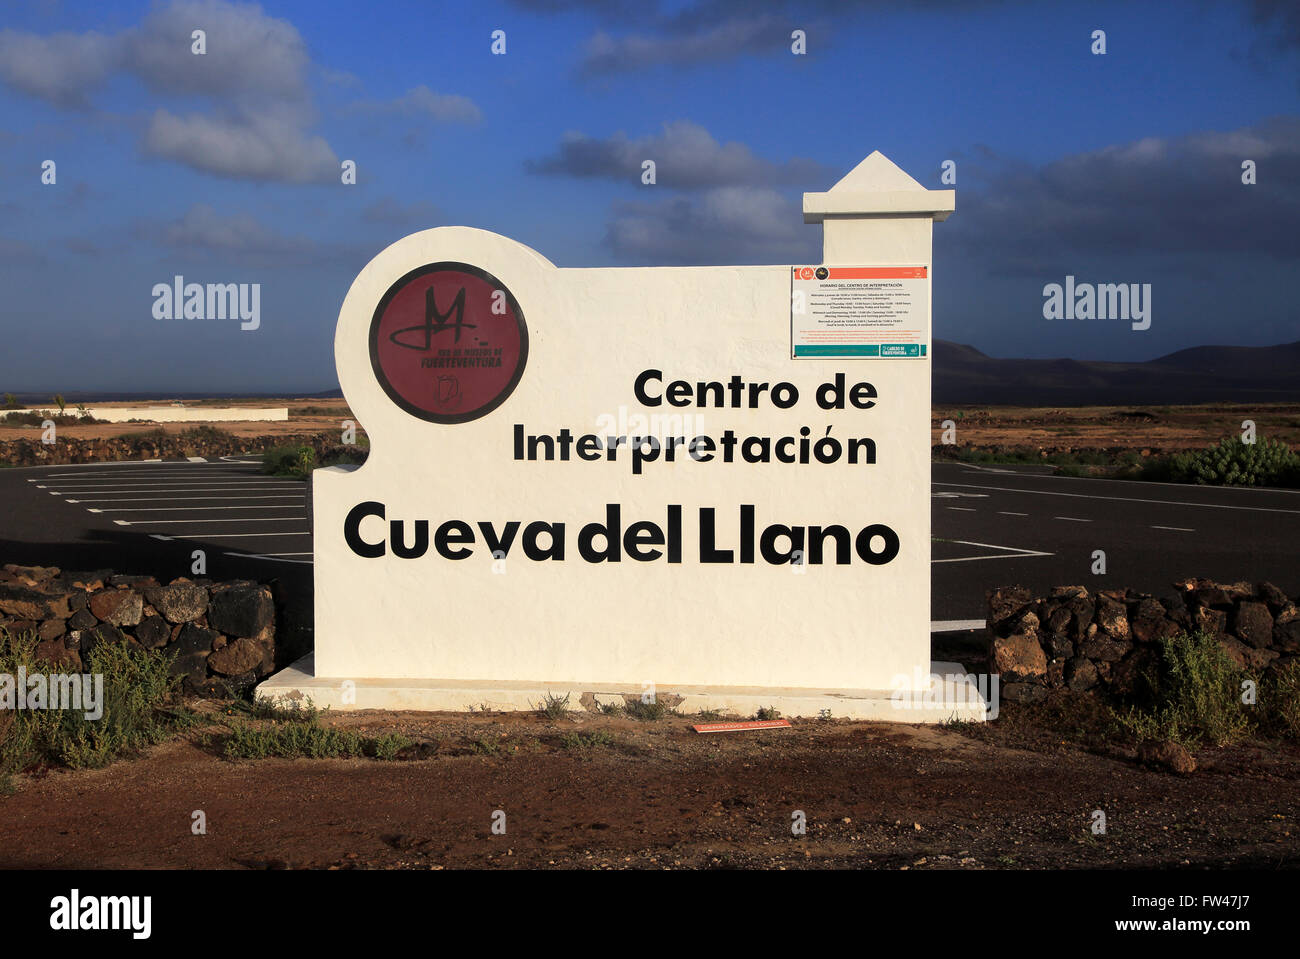 Sign for interpretation centre, Cueva del Llano, La Oliva, Fuerteventura, Canary Islands, Spain - Stock Image